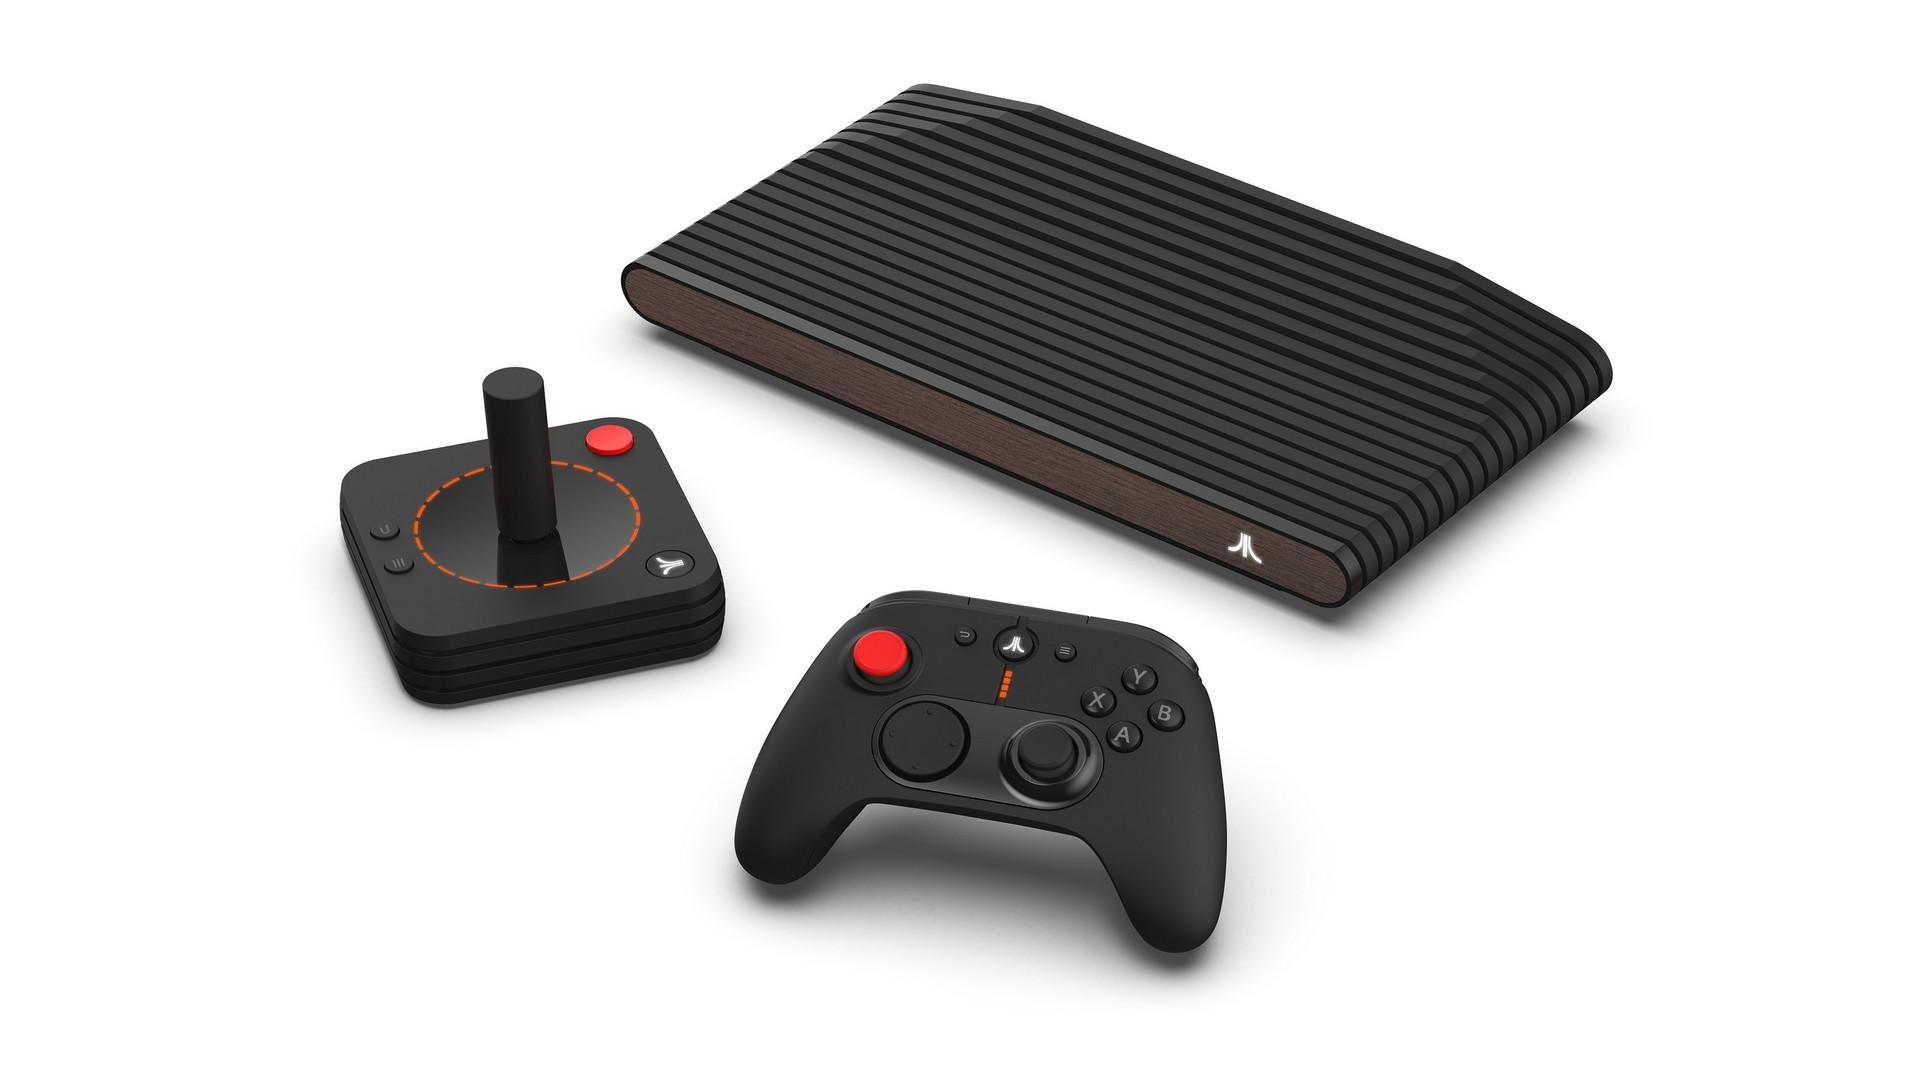 Atari Returns With The New Atari VCS On 10 June In Australia